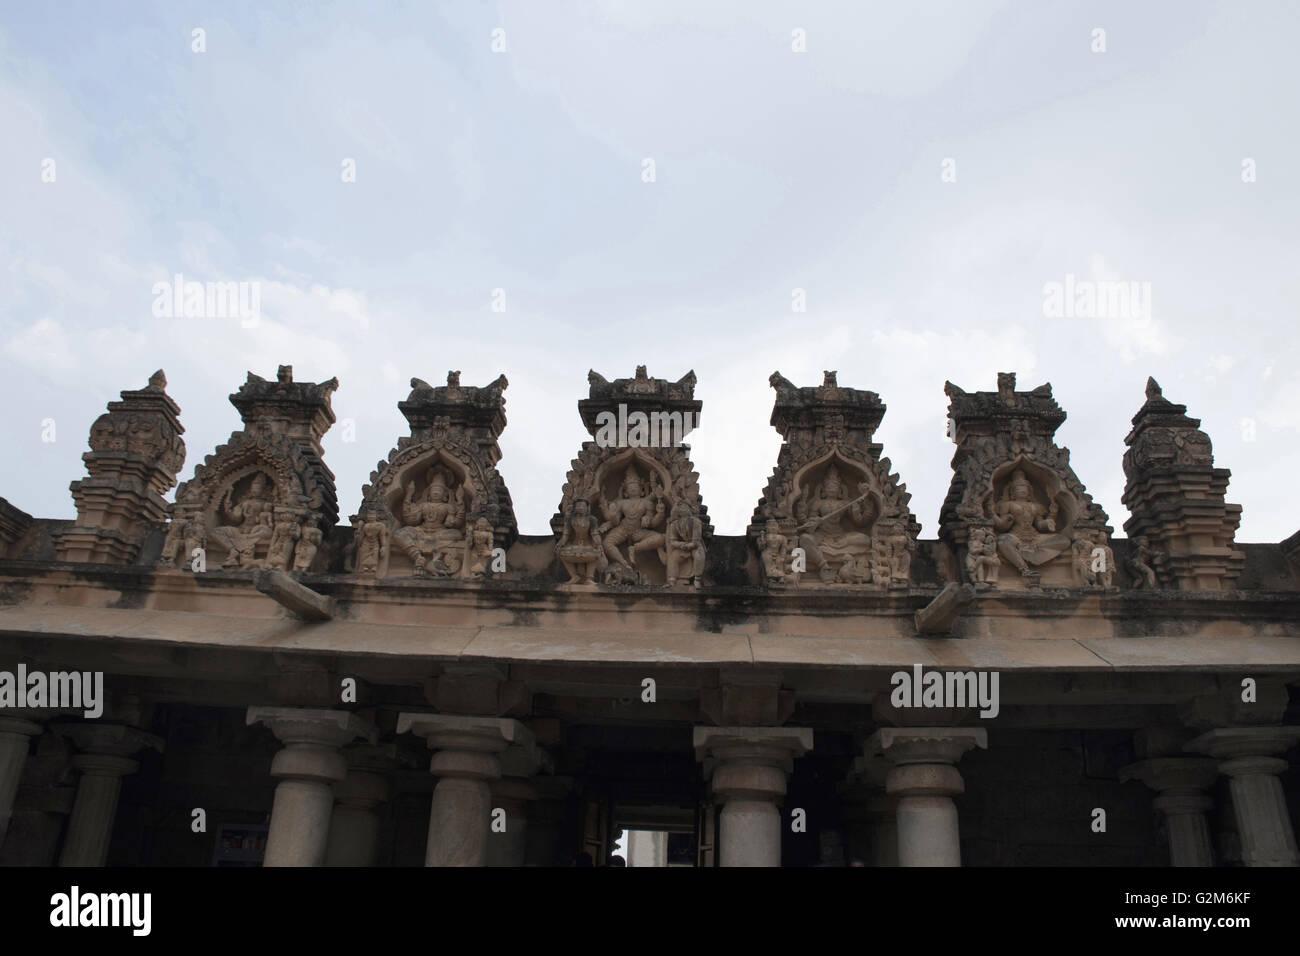 Carved figures at the top of the entrance porch, Gomateshwara temple, Vindhyagiri Hill, Shravanbelgola, Karnataka, Stock Photo